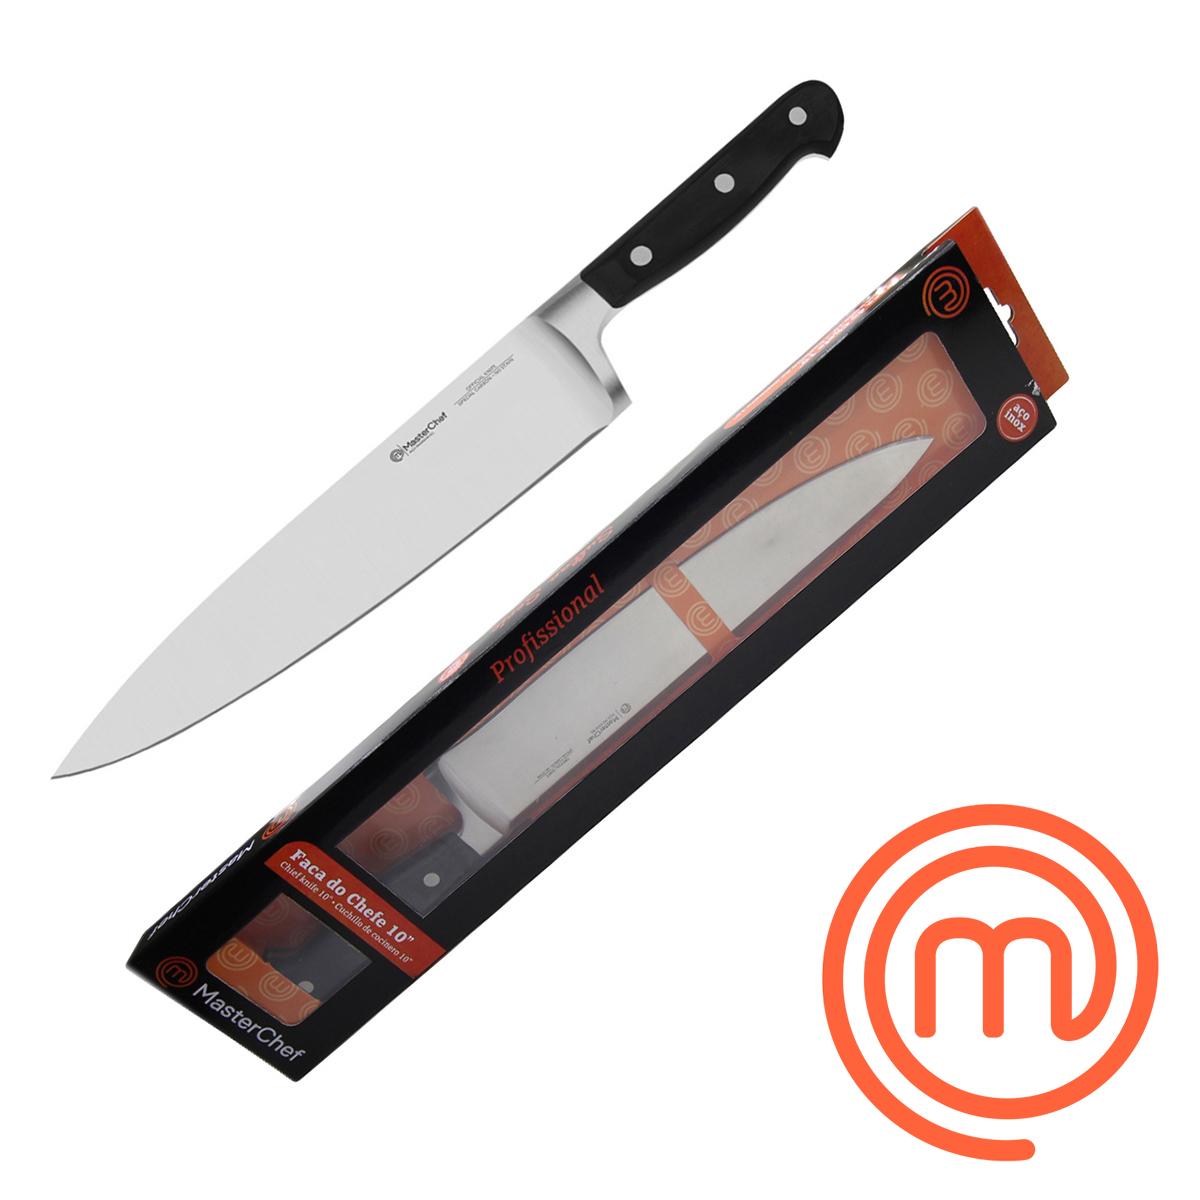 Kit 8 Facas 6/8/10 Filetar/Desossar MasterChef Profissional